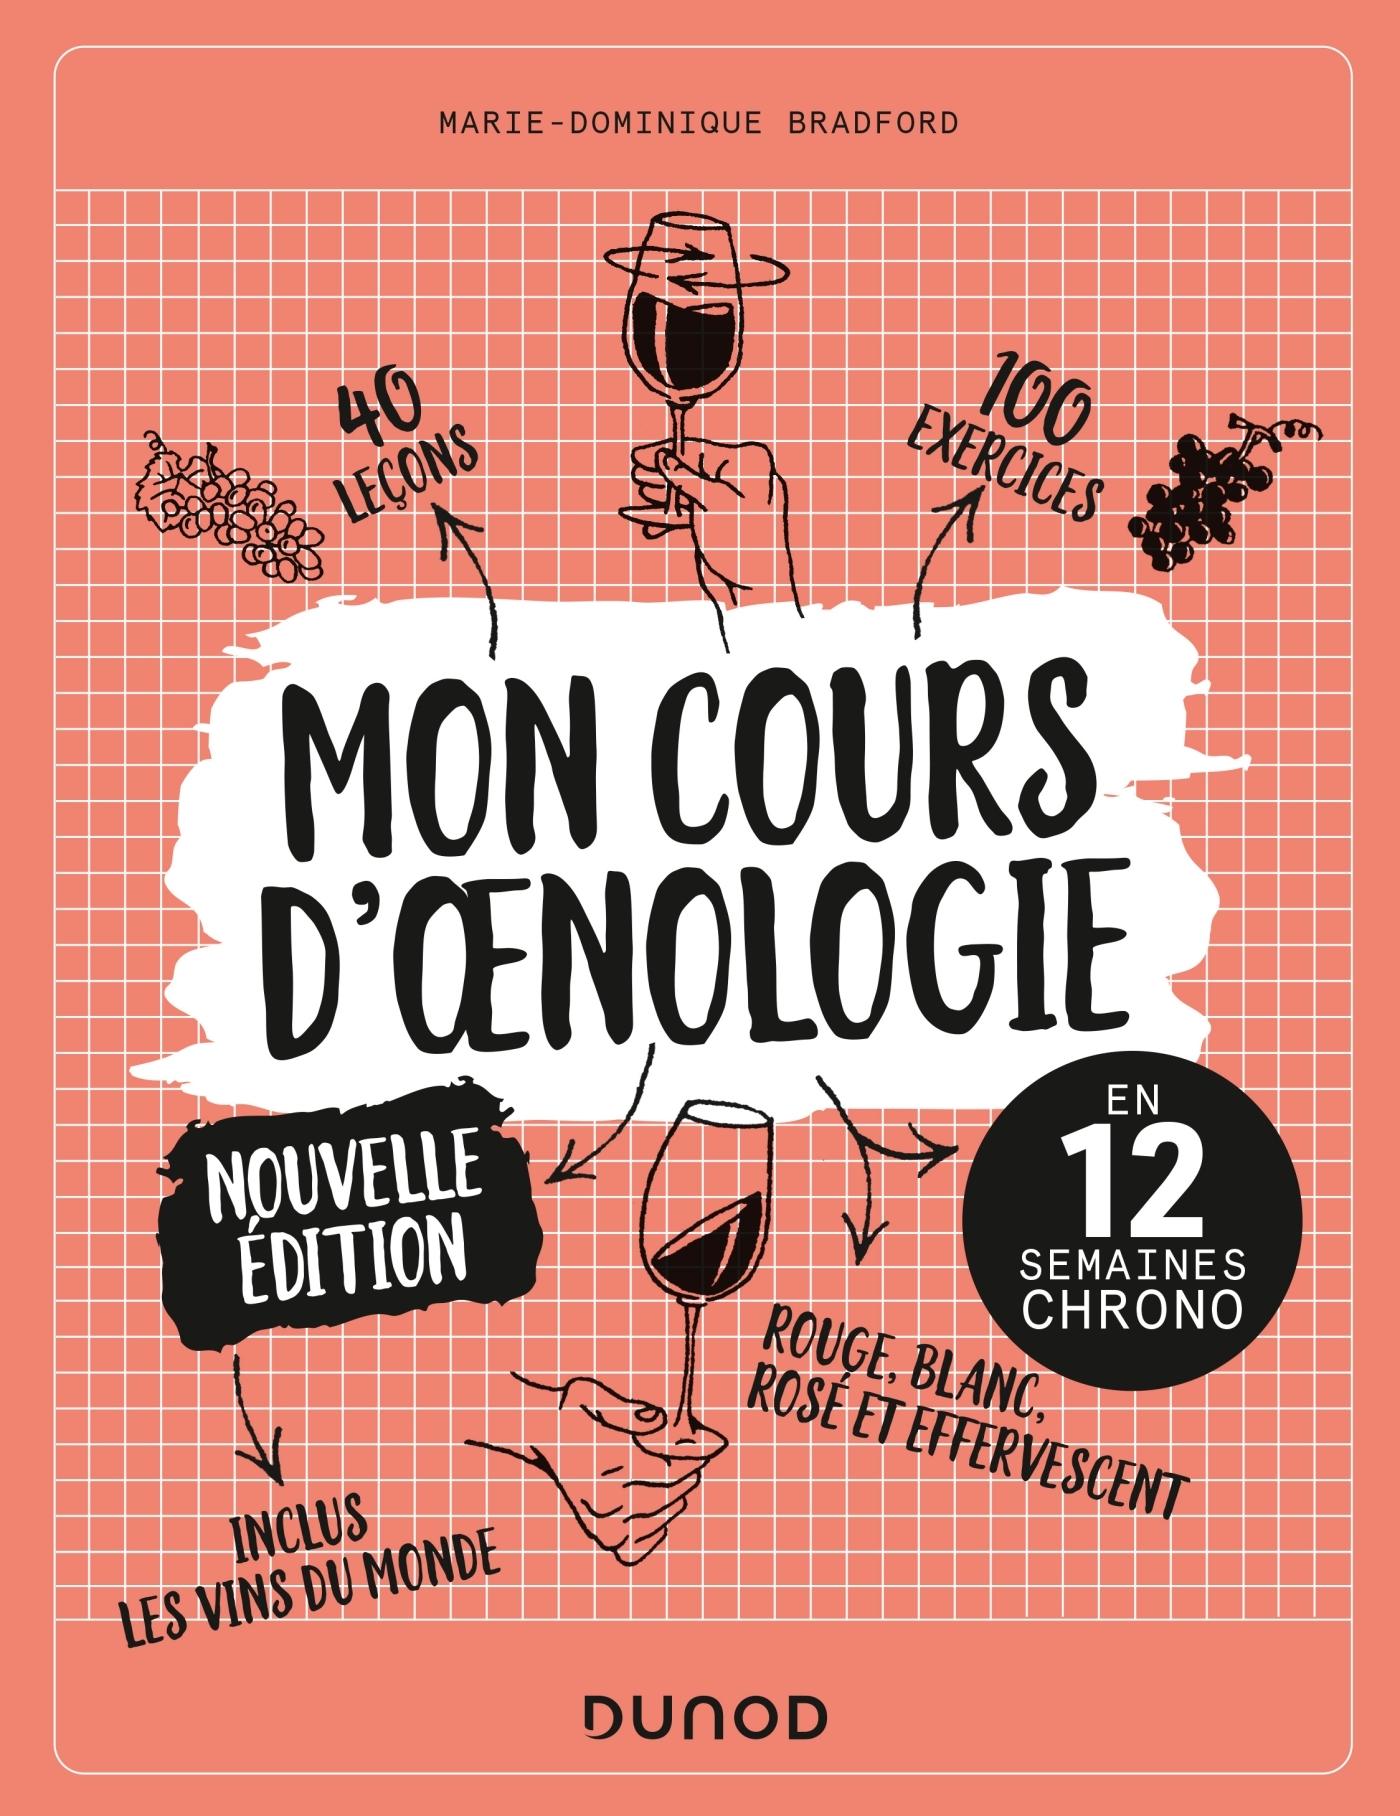 MON COURS D'OENOLOGIE - 2 ED. - EN 12 SEMAINES CHRONO